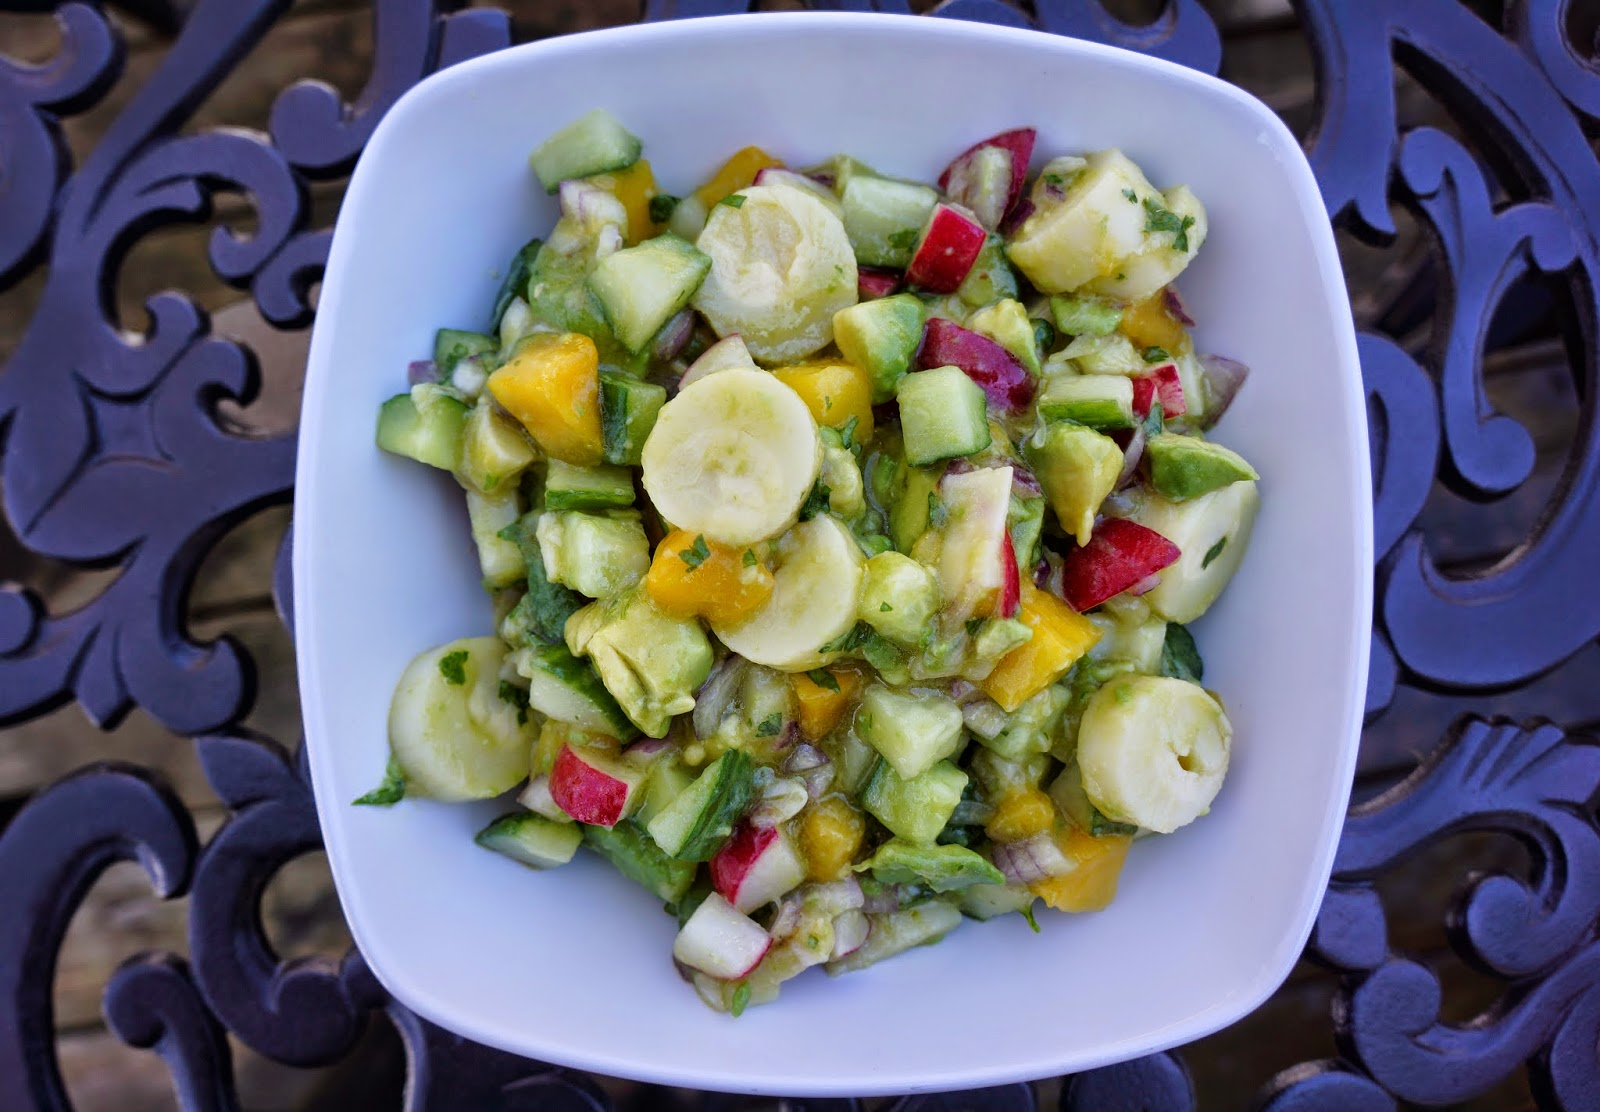 Hearts of palm, mango and avocado salad